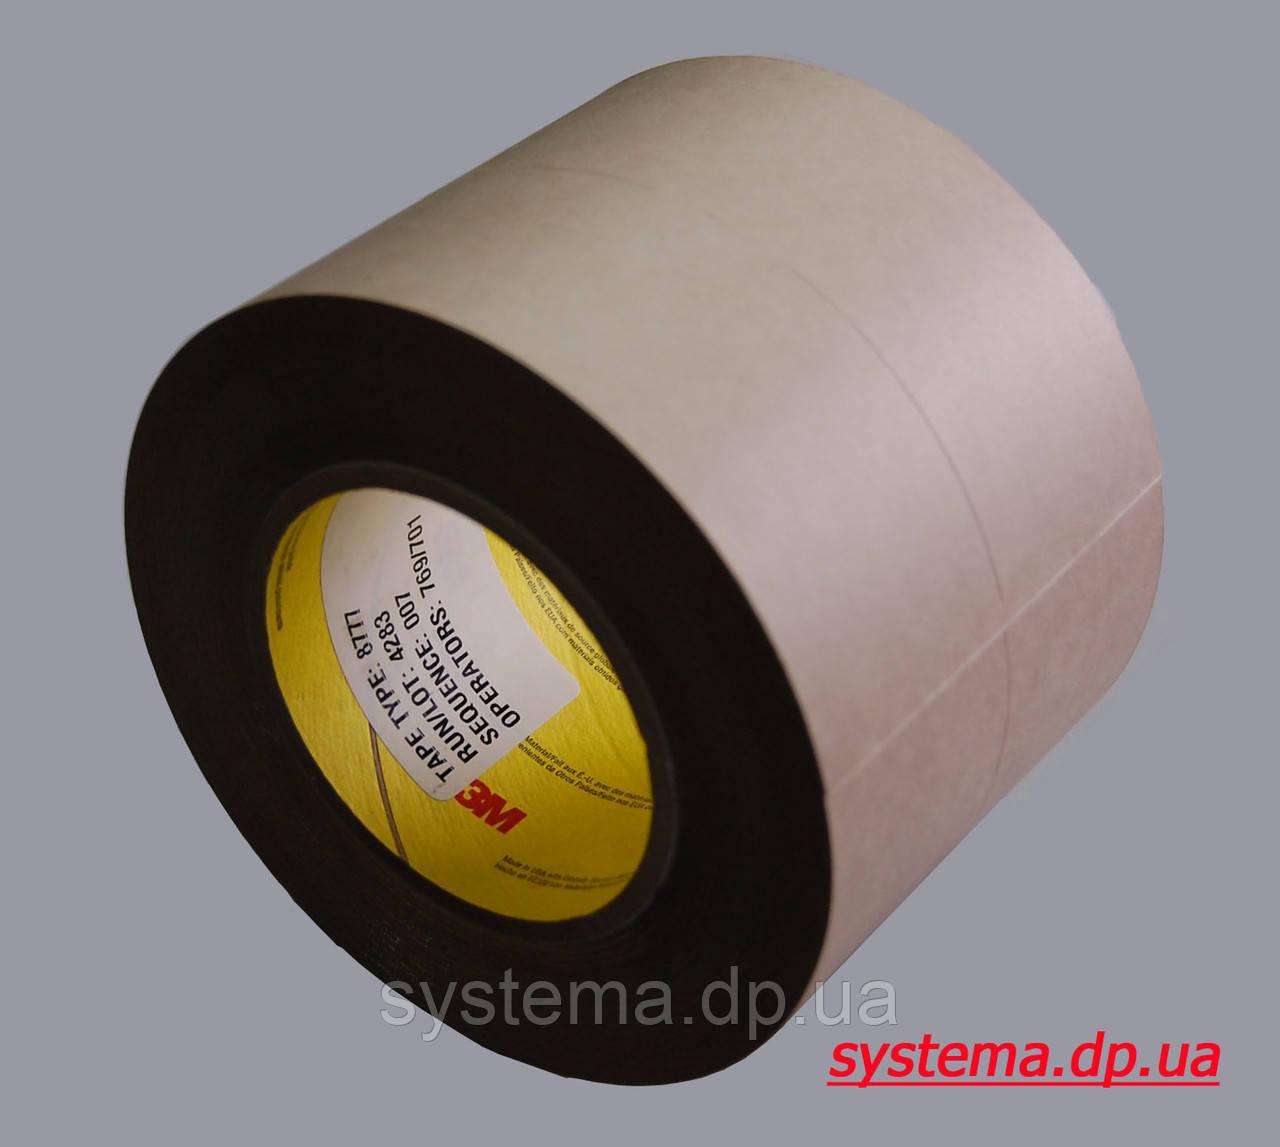 3M Flexible Air Sealing Tape 8777 - Эластичная герметизирующая лента 100,0х0,13 мм 50/50, рулон 23 м